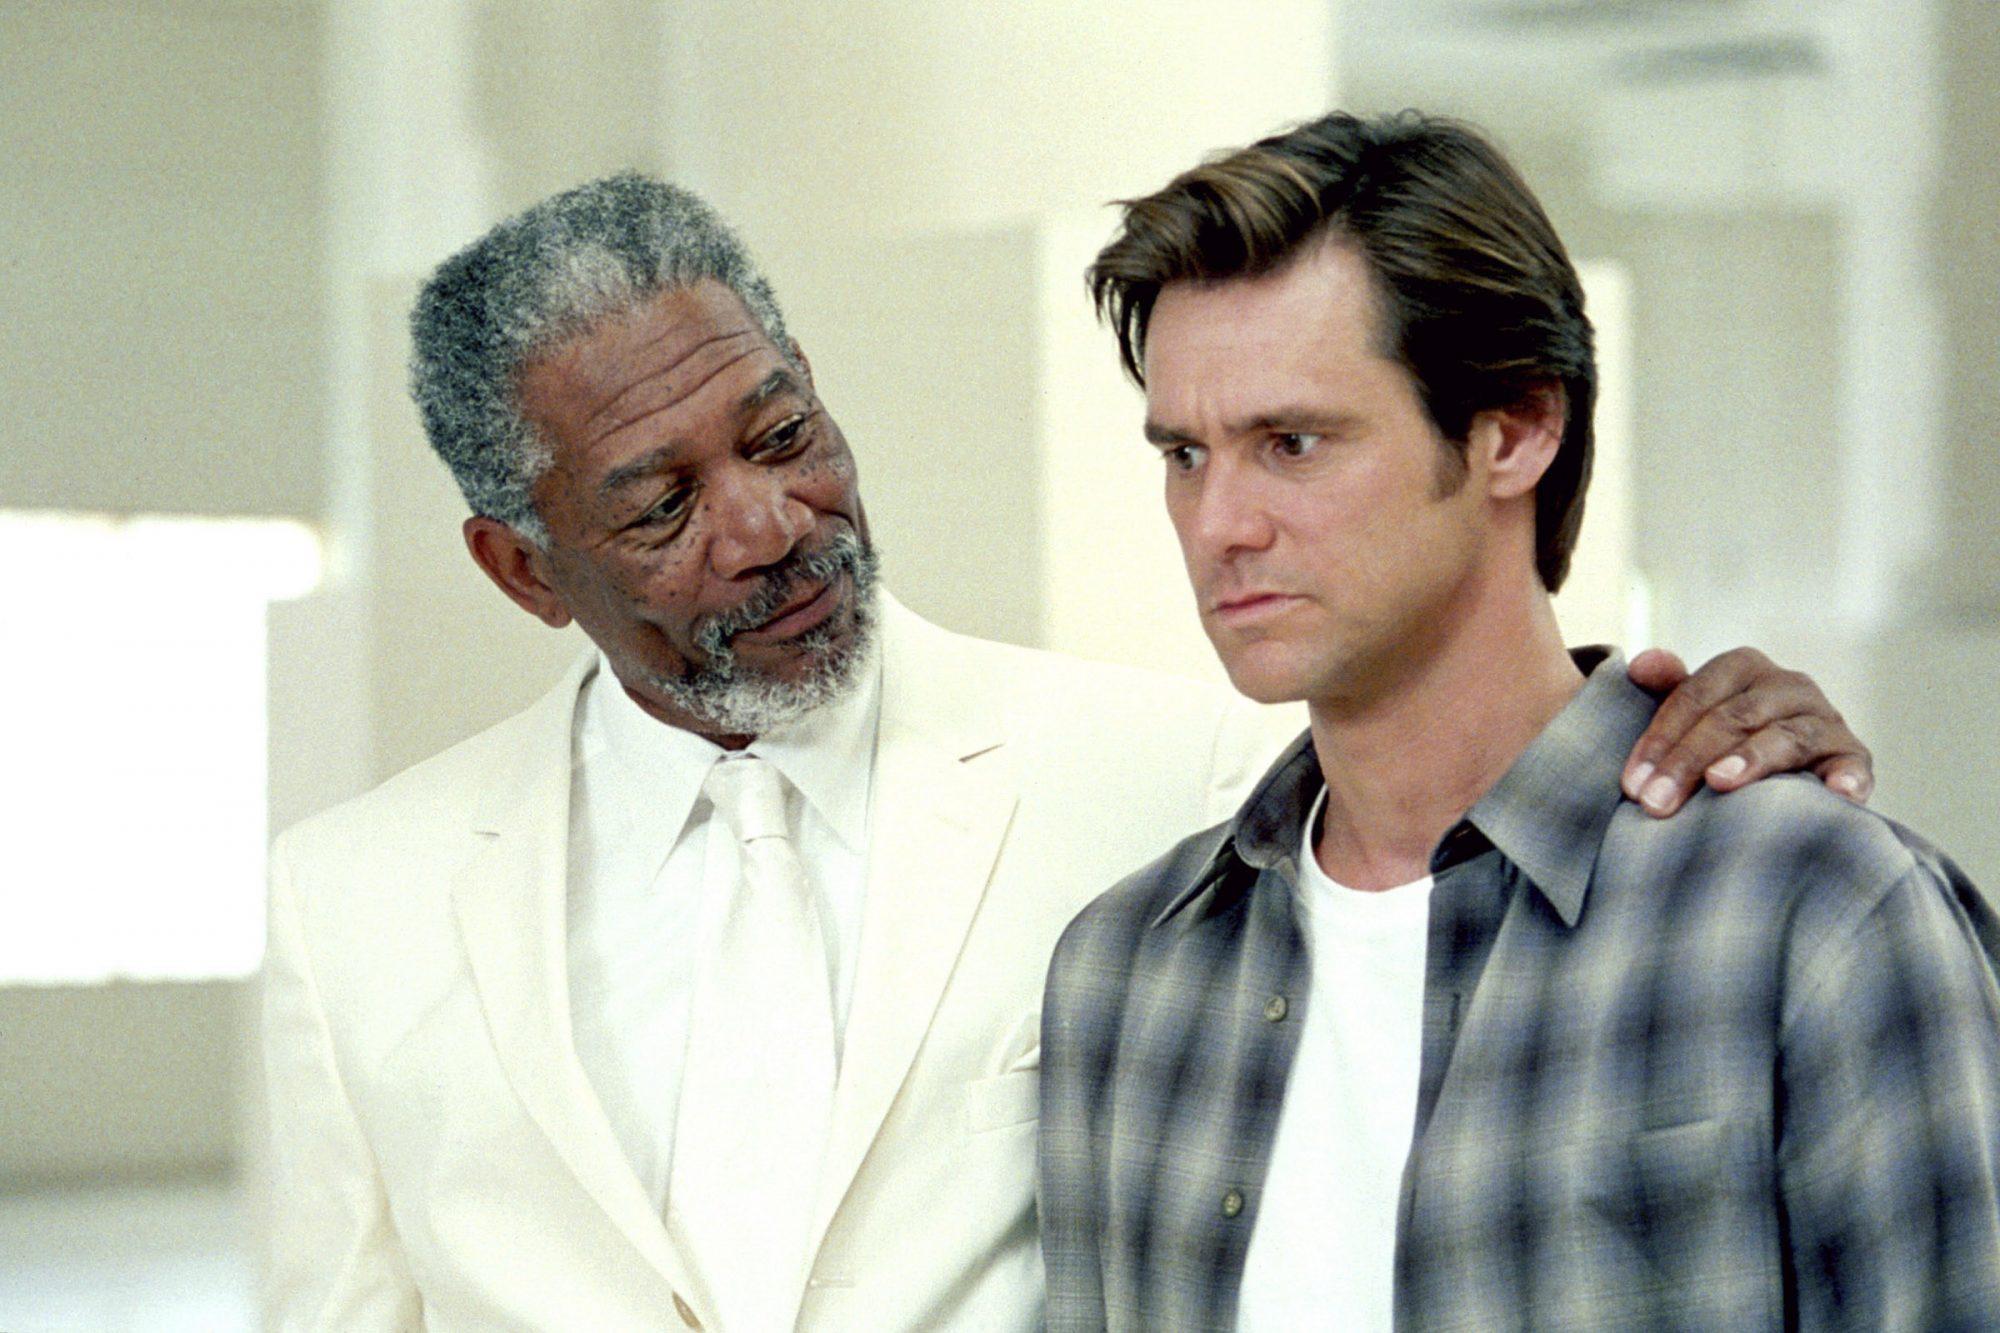 BRUCE ALMIGHTY, Morgan Freeman, Jim Carrey, 2003, (c) Universal/courtesy Everett Collection